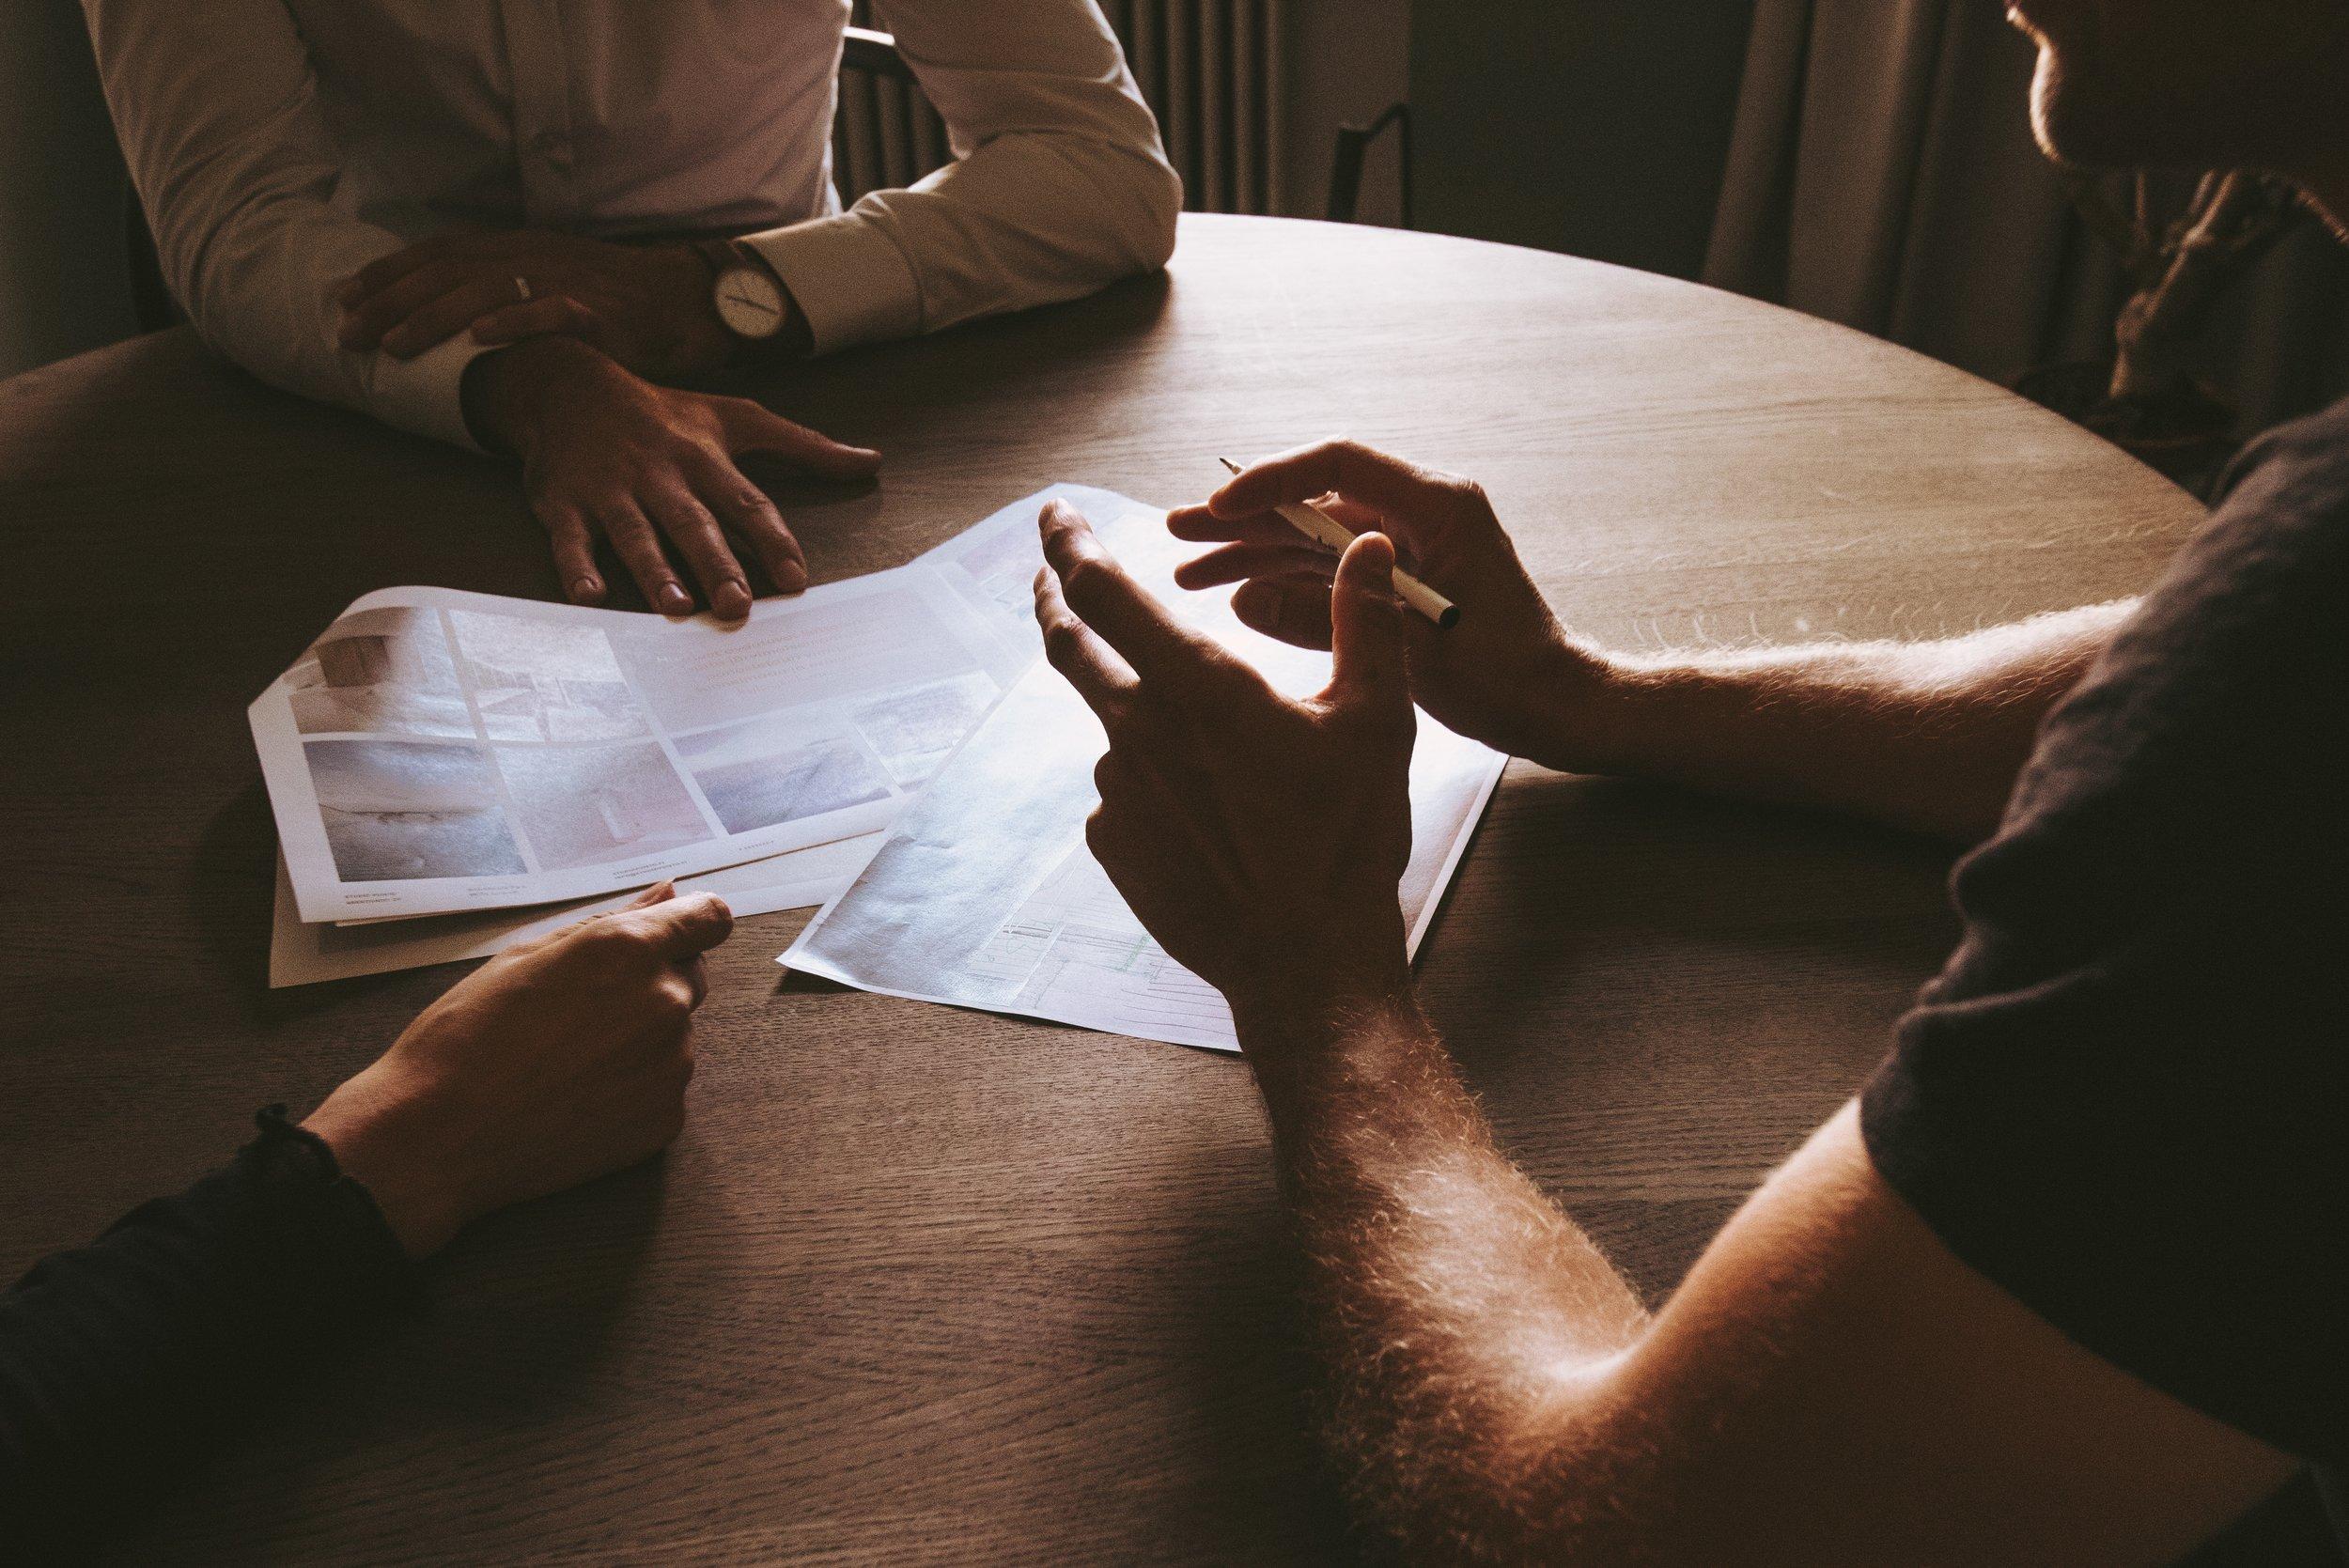 collaborative divorce saves money